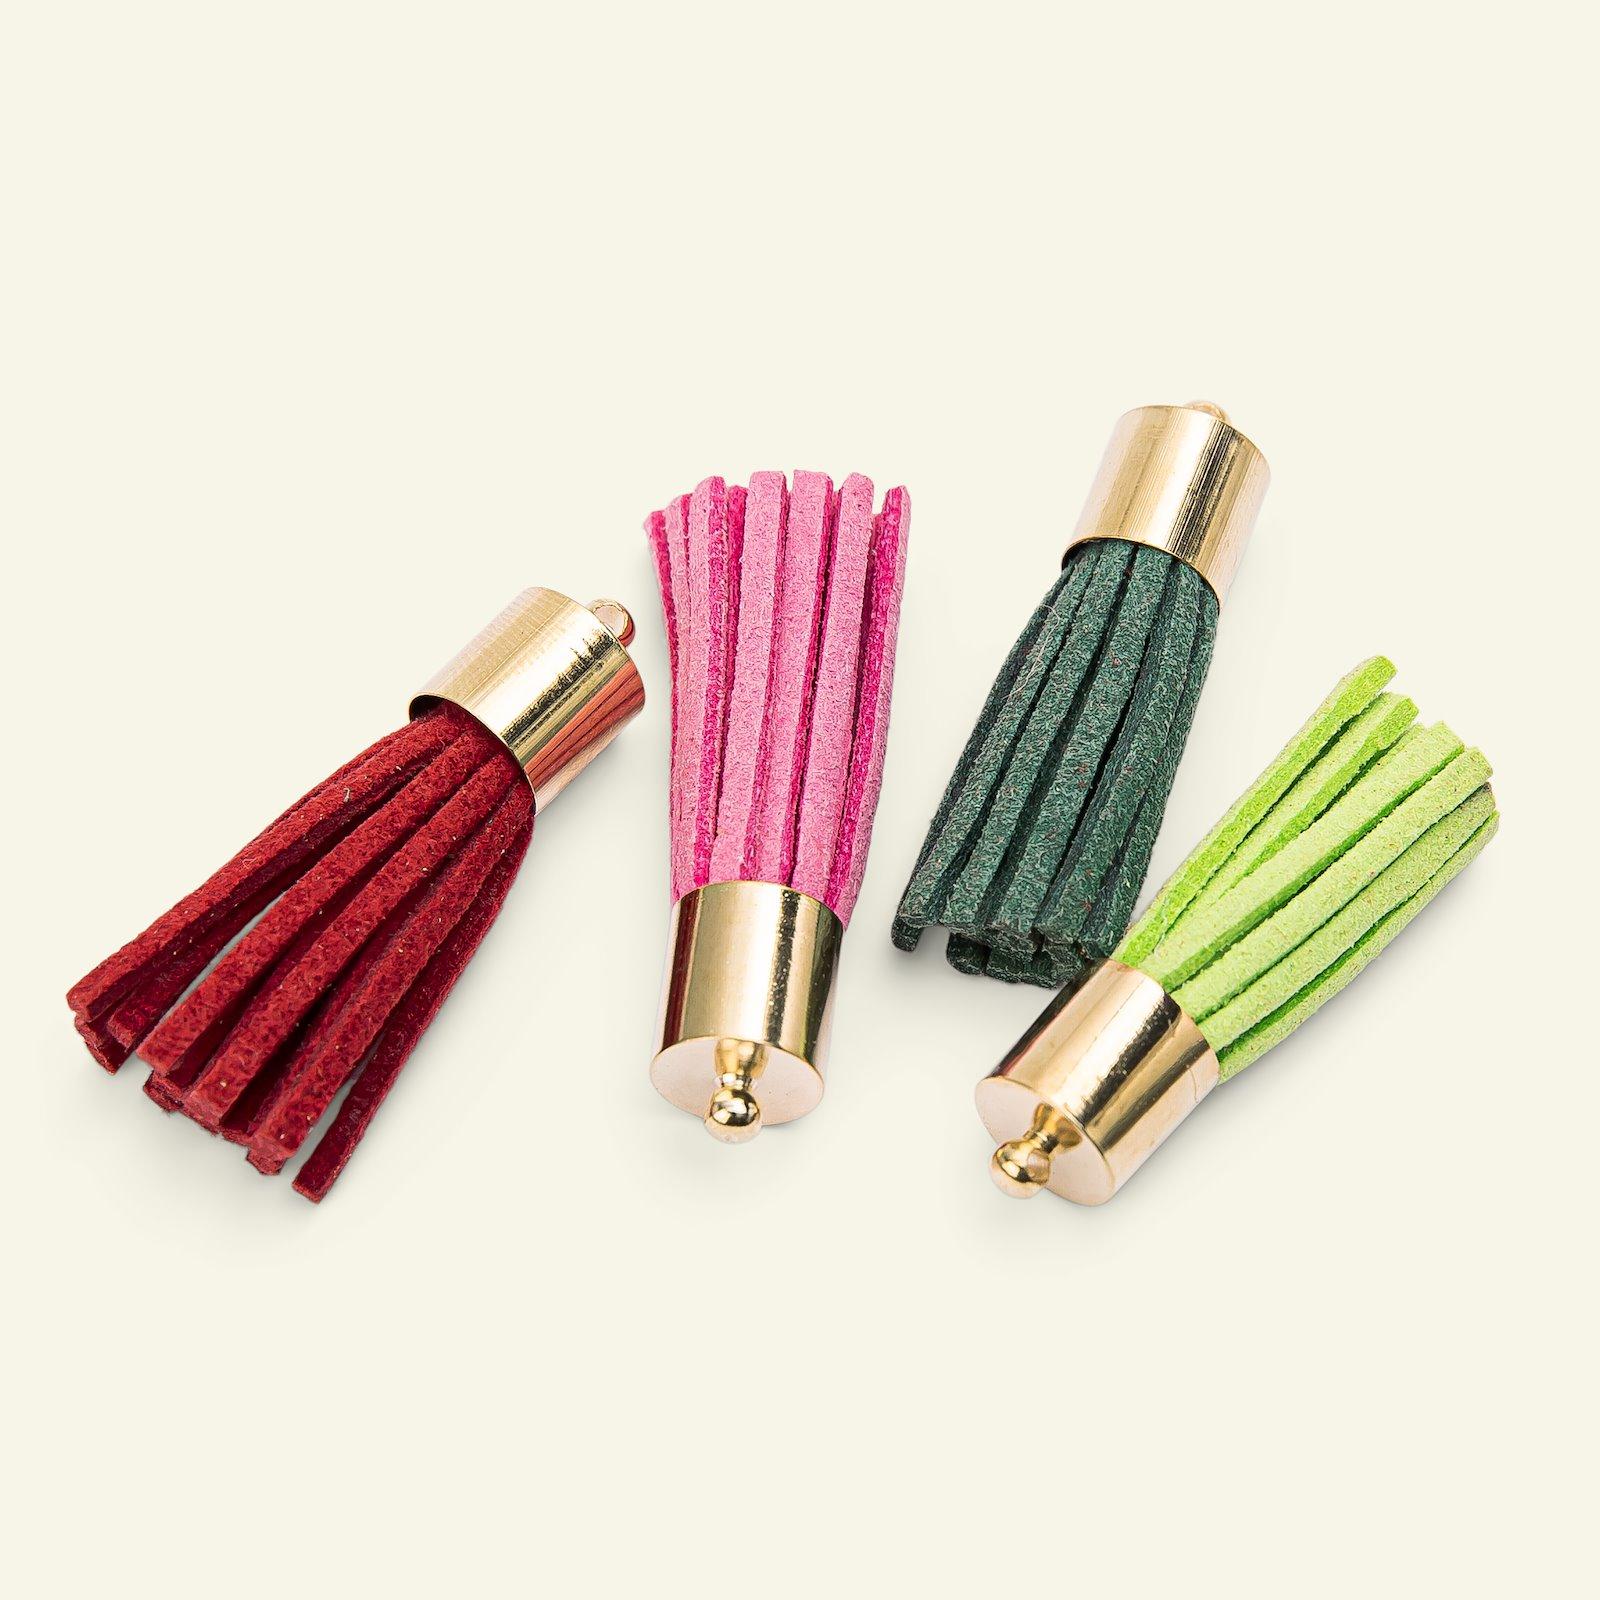 Pendant tassels 35mm 4 colors 4pcs 48699_pack